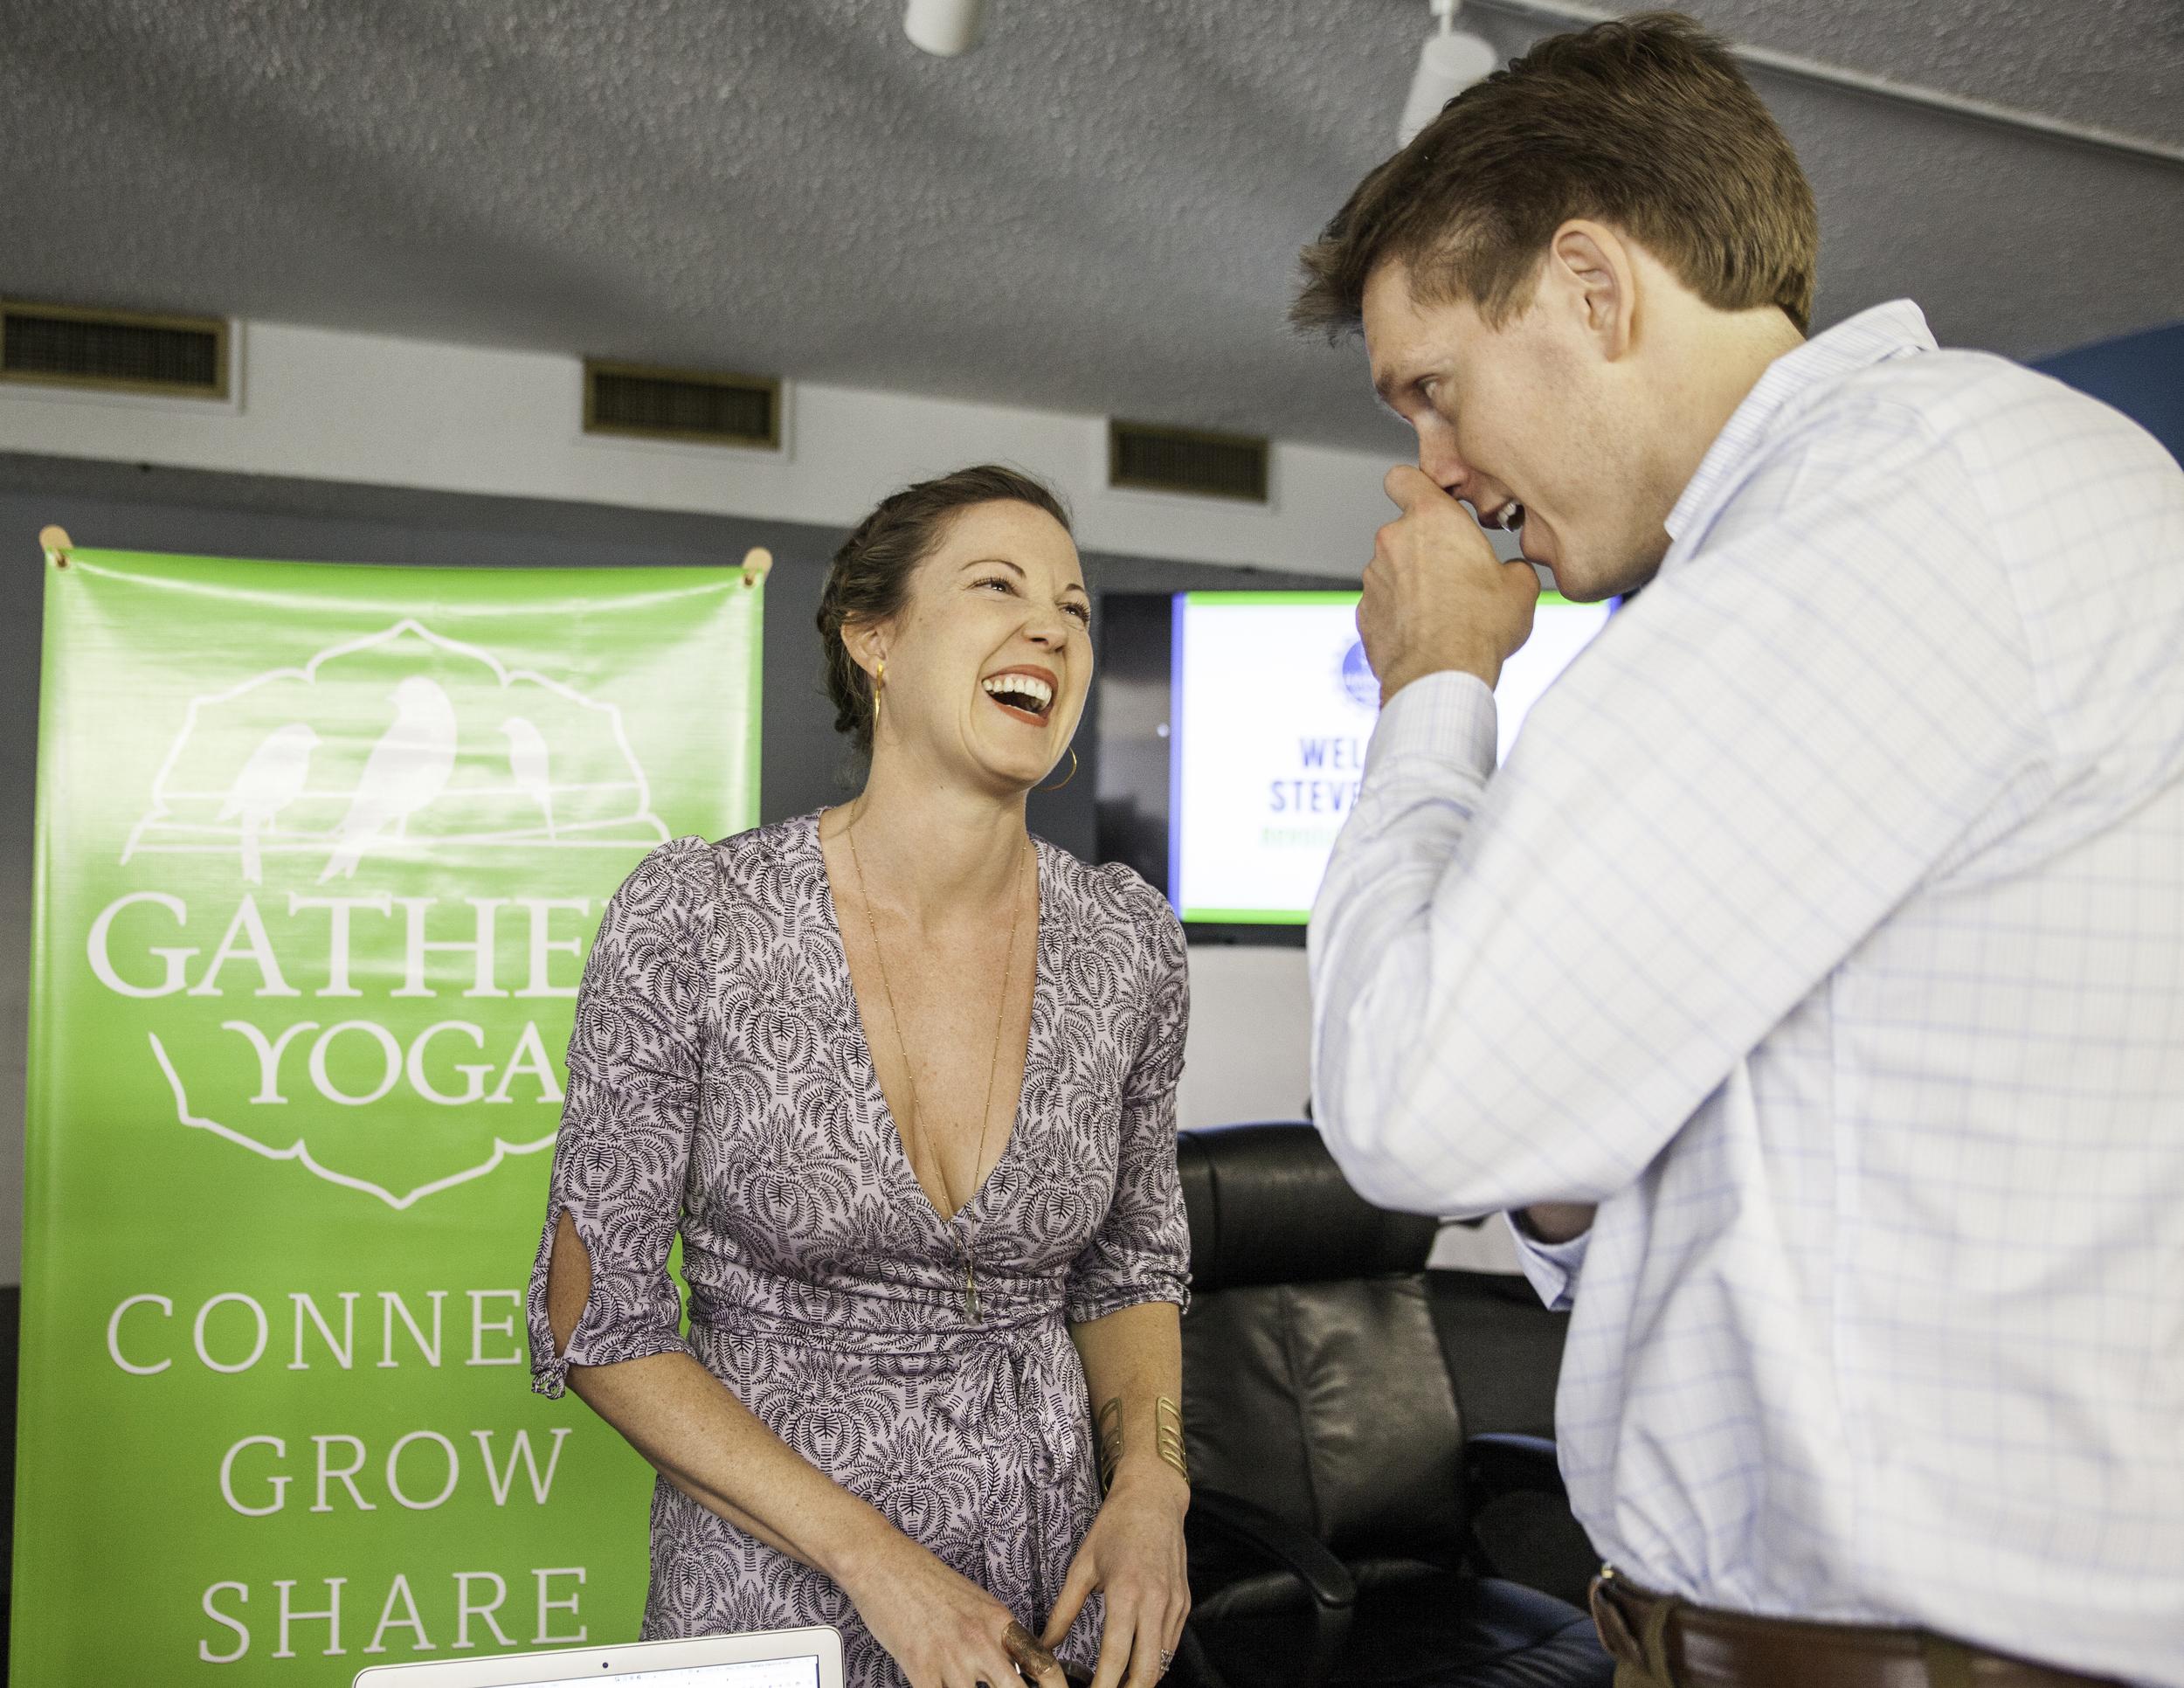 Natalie Halt (Gather Yoga) meets Steve Case and Revolution Ventures at The Harbor Downtown